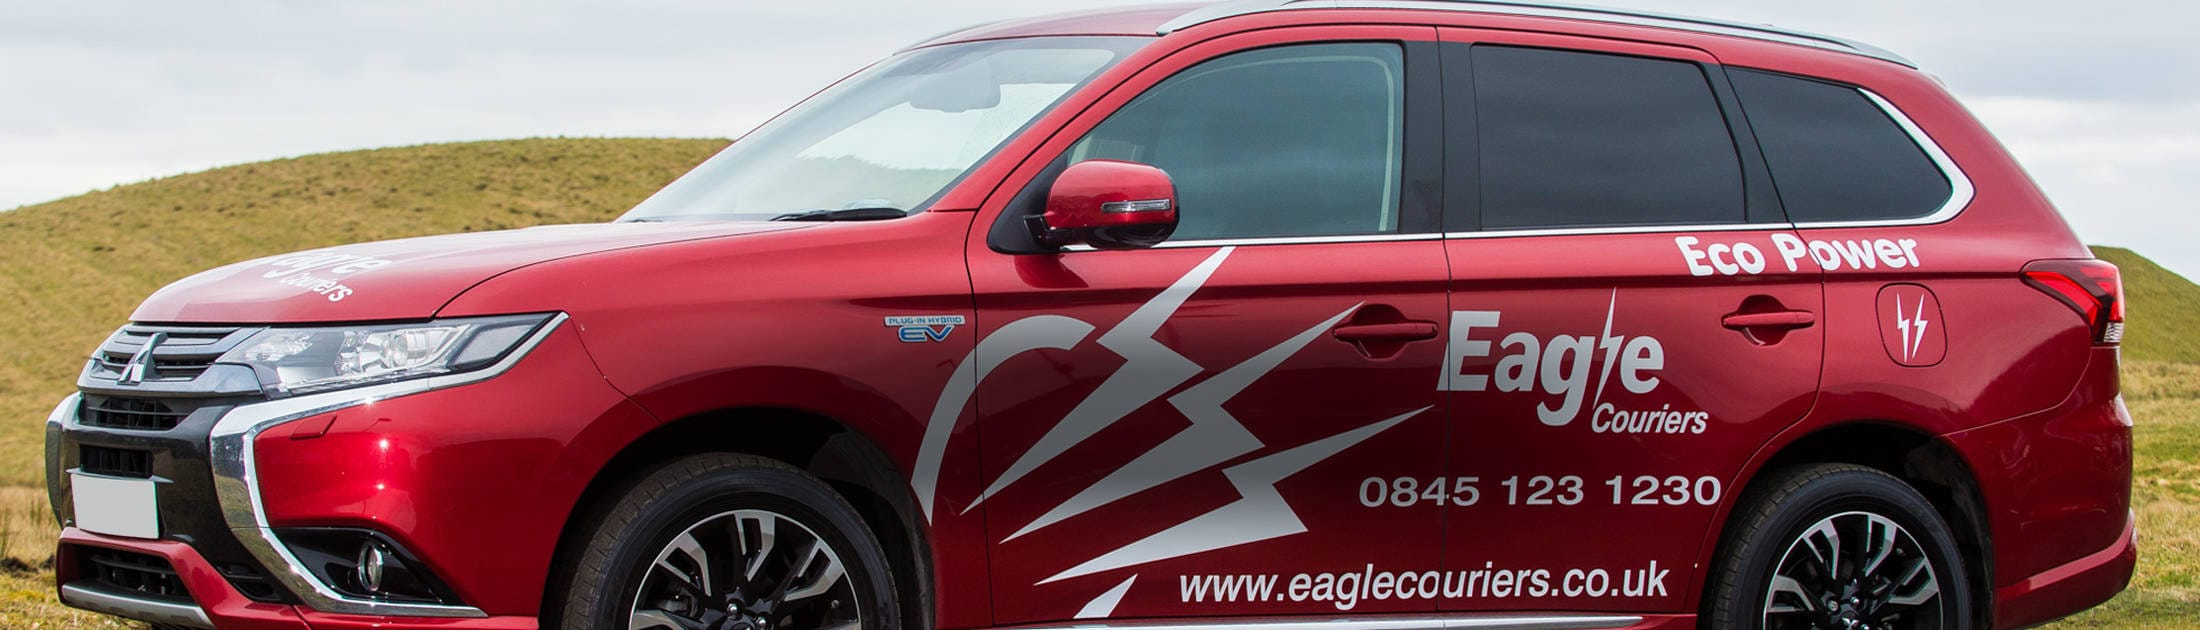 Eagle Couriers Eco Car